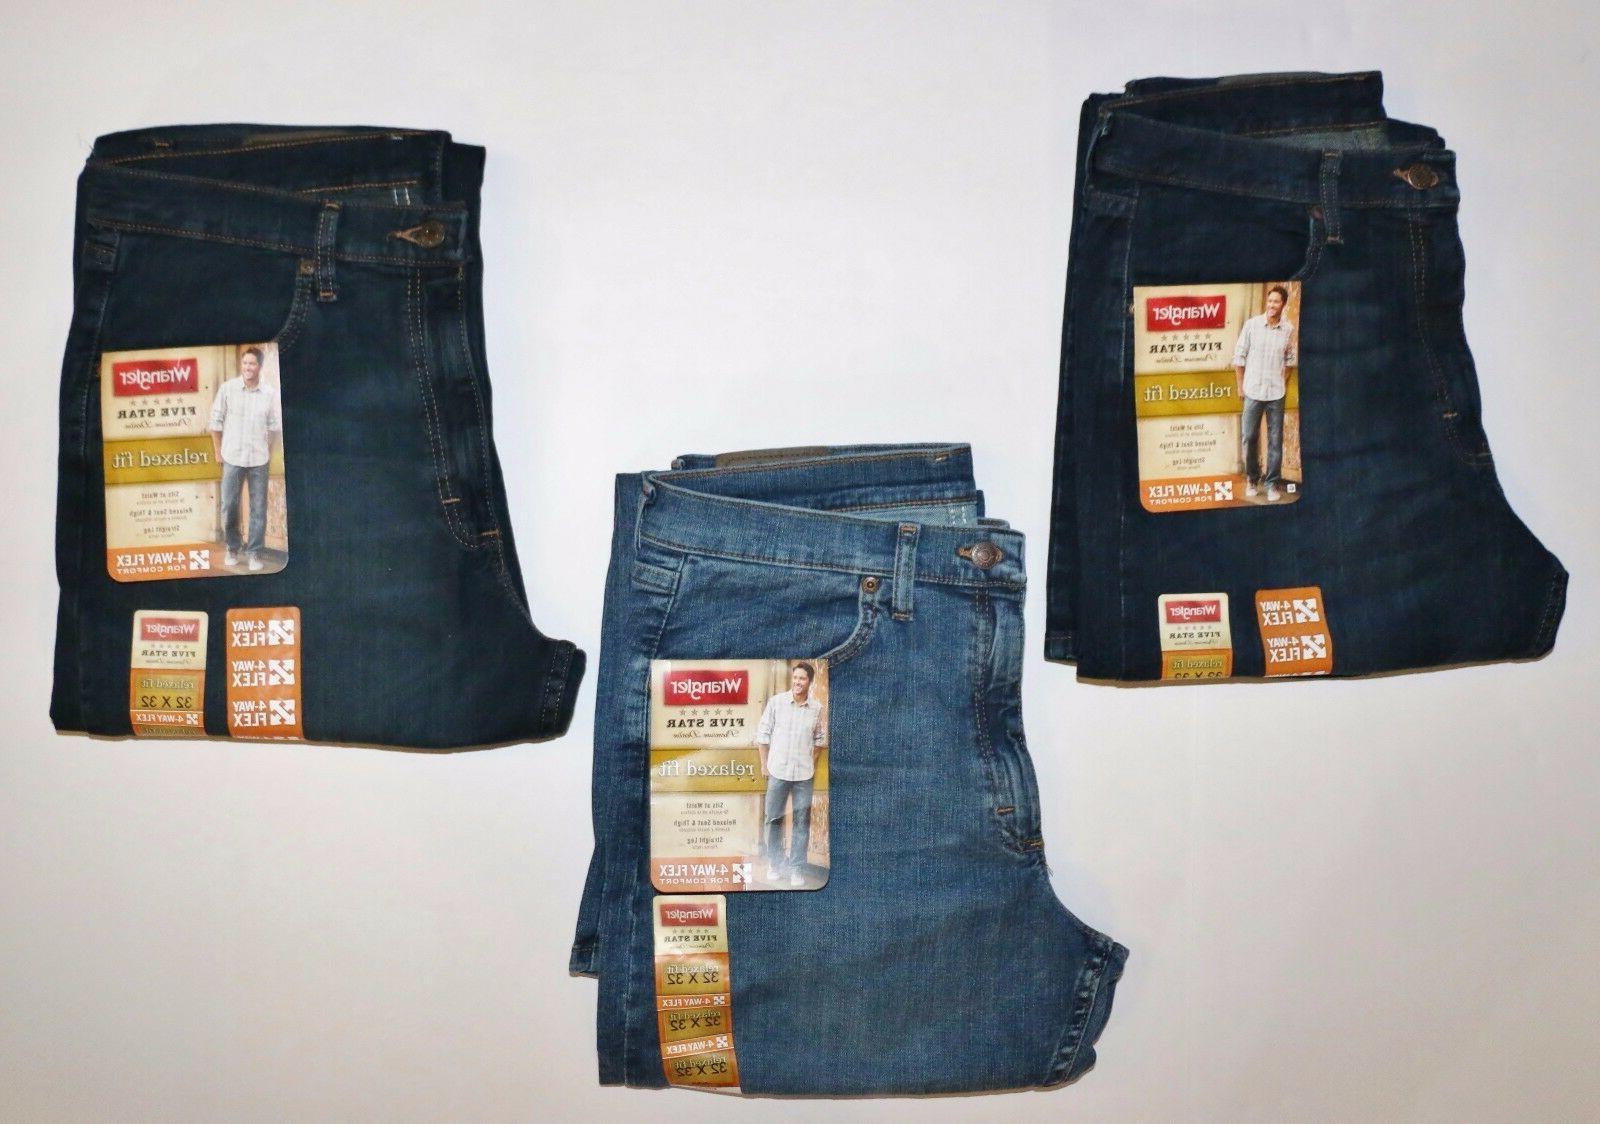 New Wrangler Jeans with Flex Dark Denim and Men's